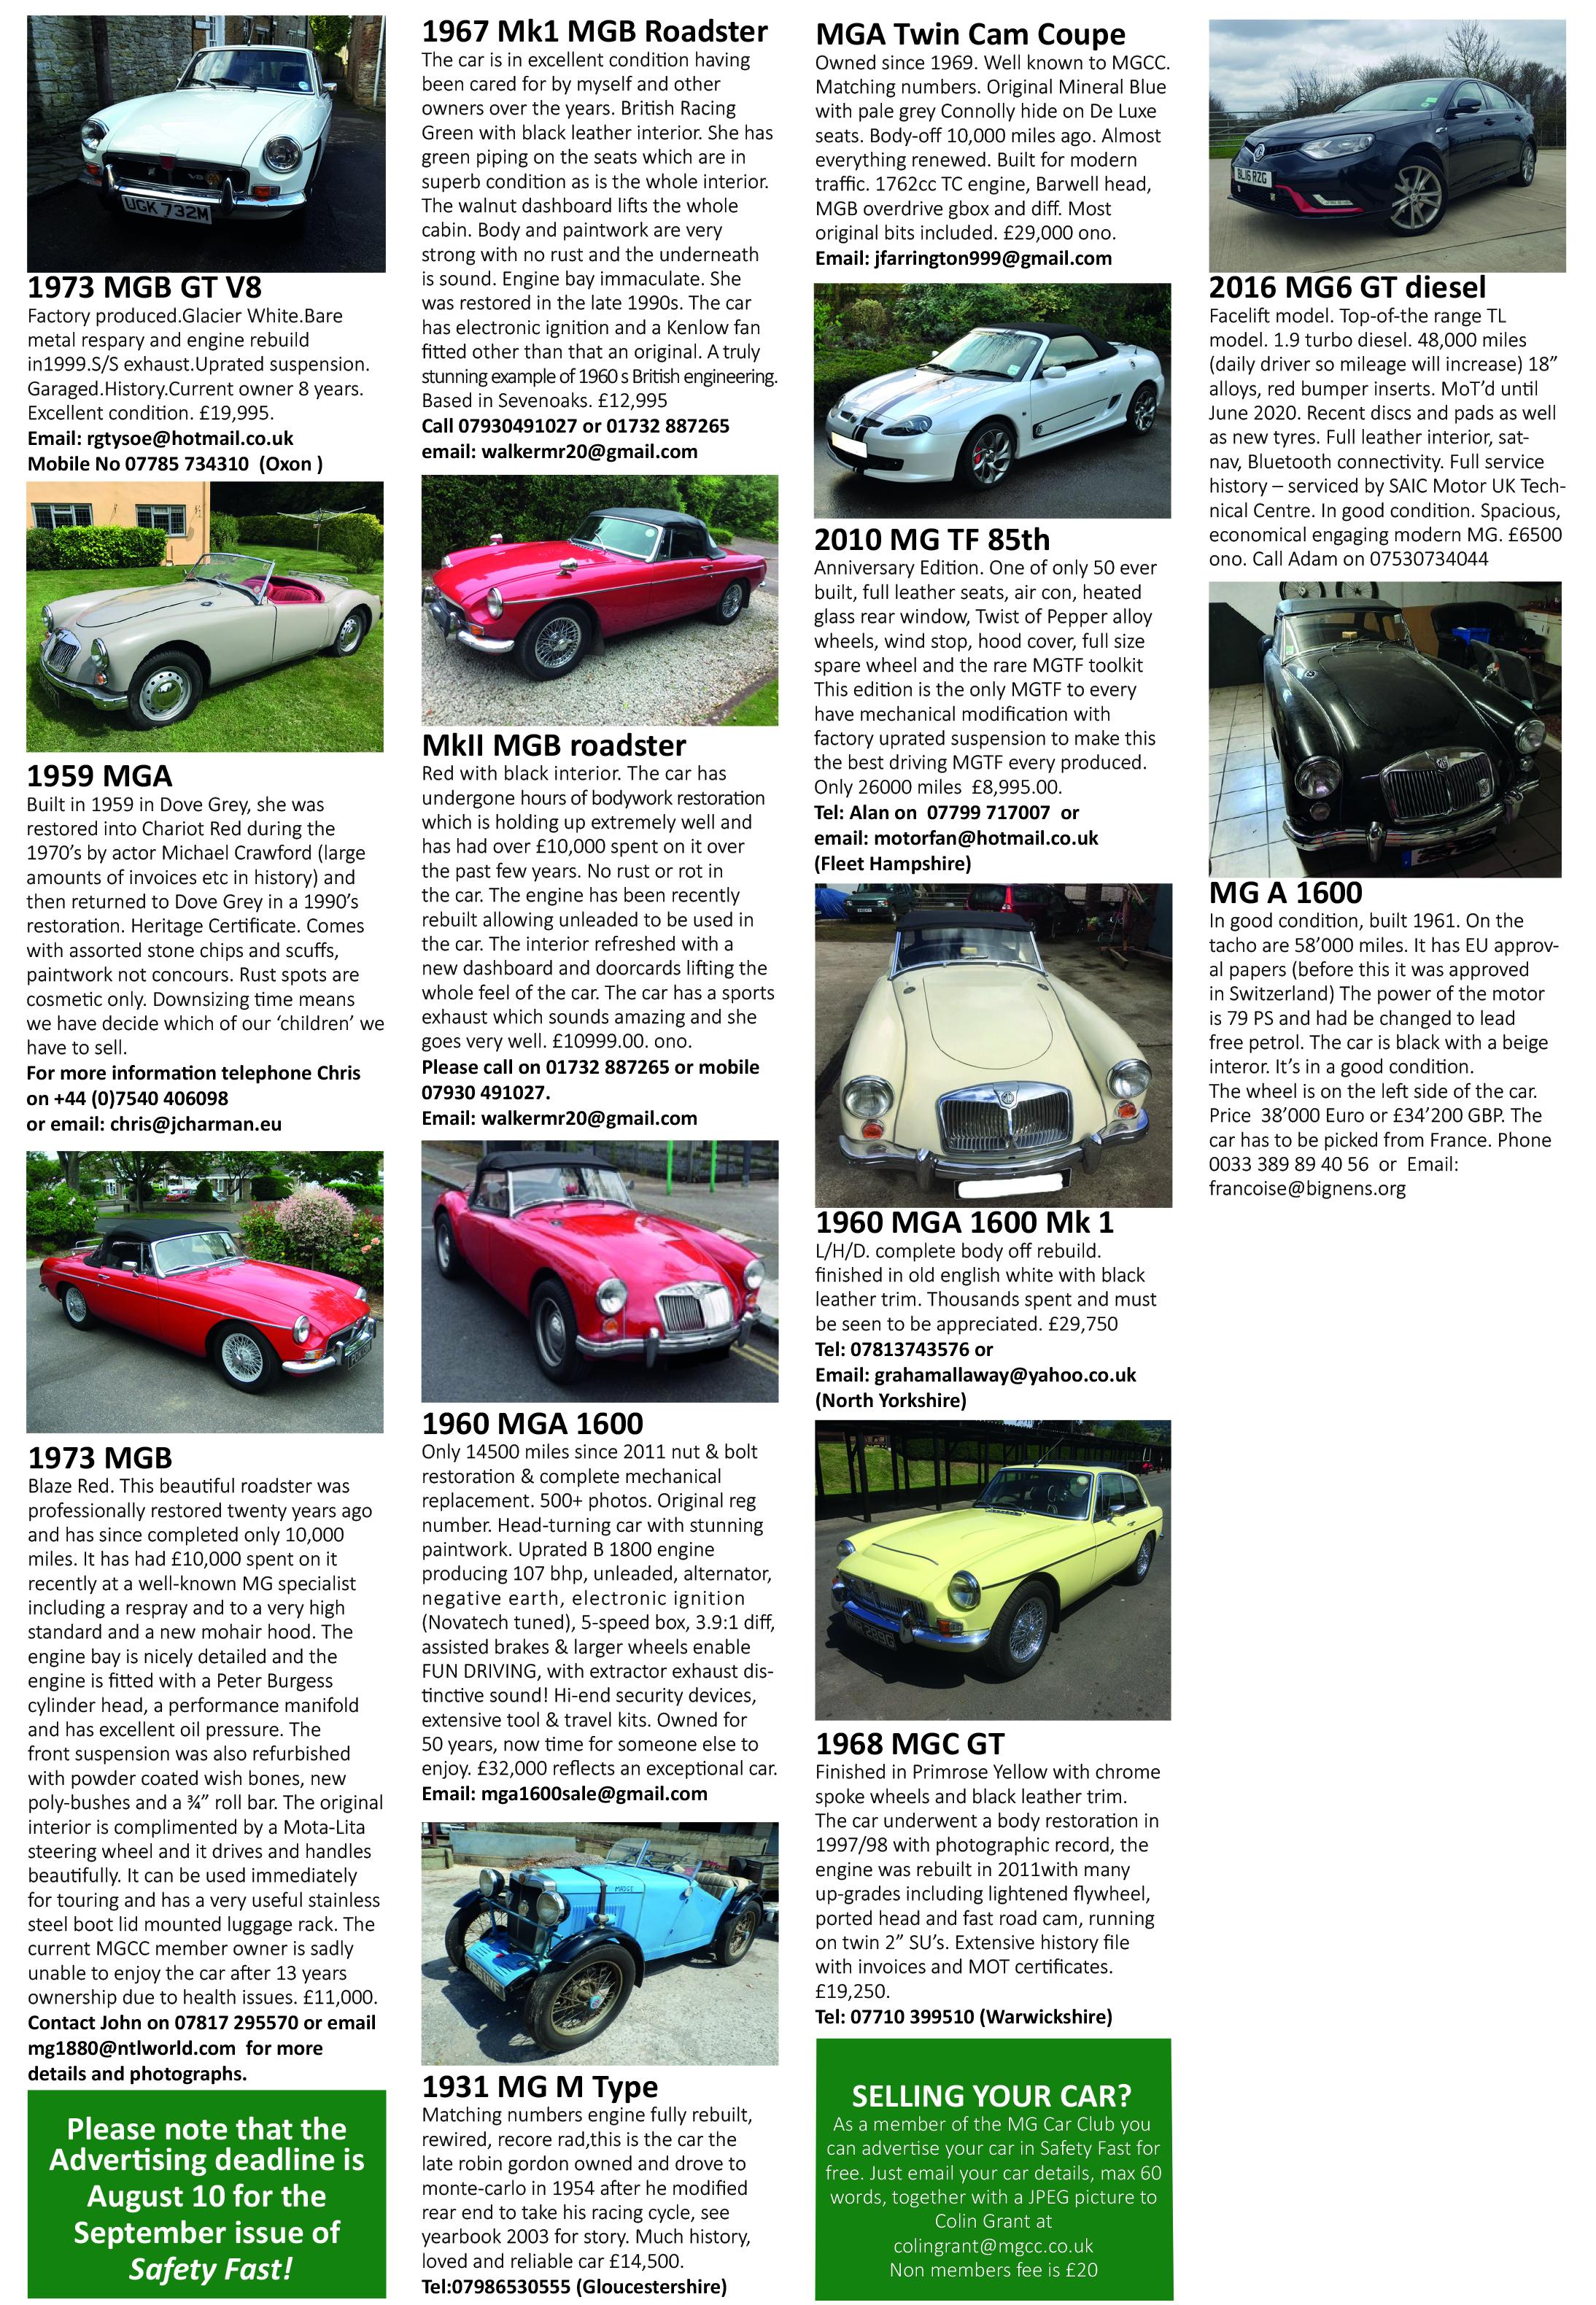 Cars For Sale Mg Car Club